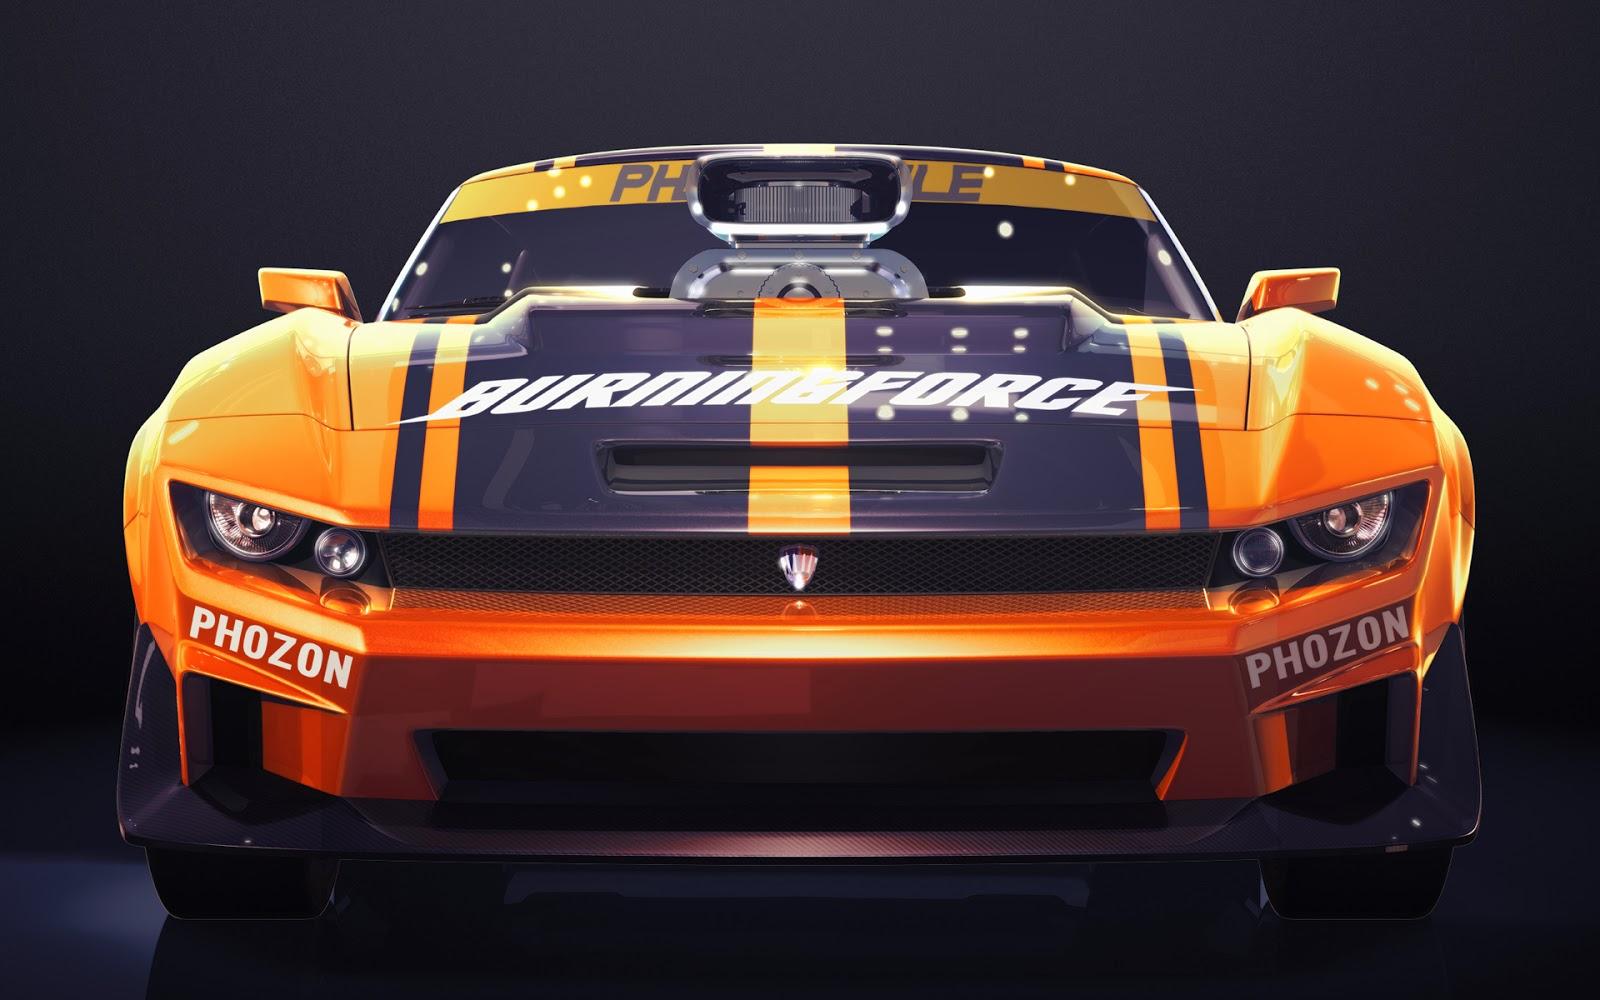 "<img src=""http://1.bp.blogspot.com/-Y0uBIqSImFE/UuTiY74POUI/AAAAAAAAKT8/pI9ulJM5XJ0/s1600/ridge-racer-wallpaper.jpg"" alt=""ridge racer wallpaper"" />"